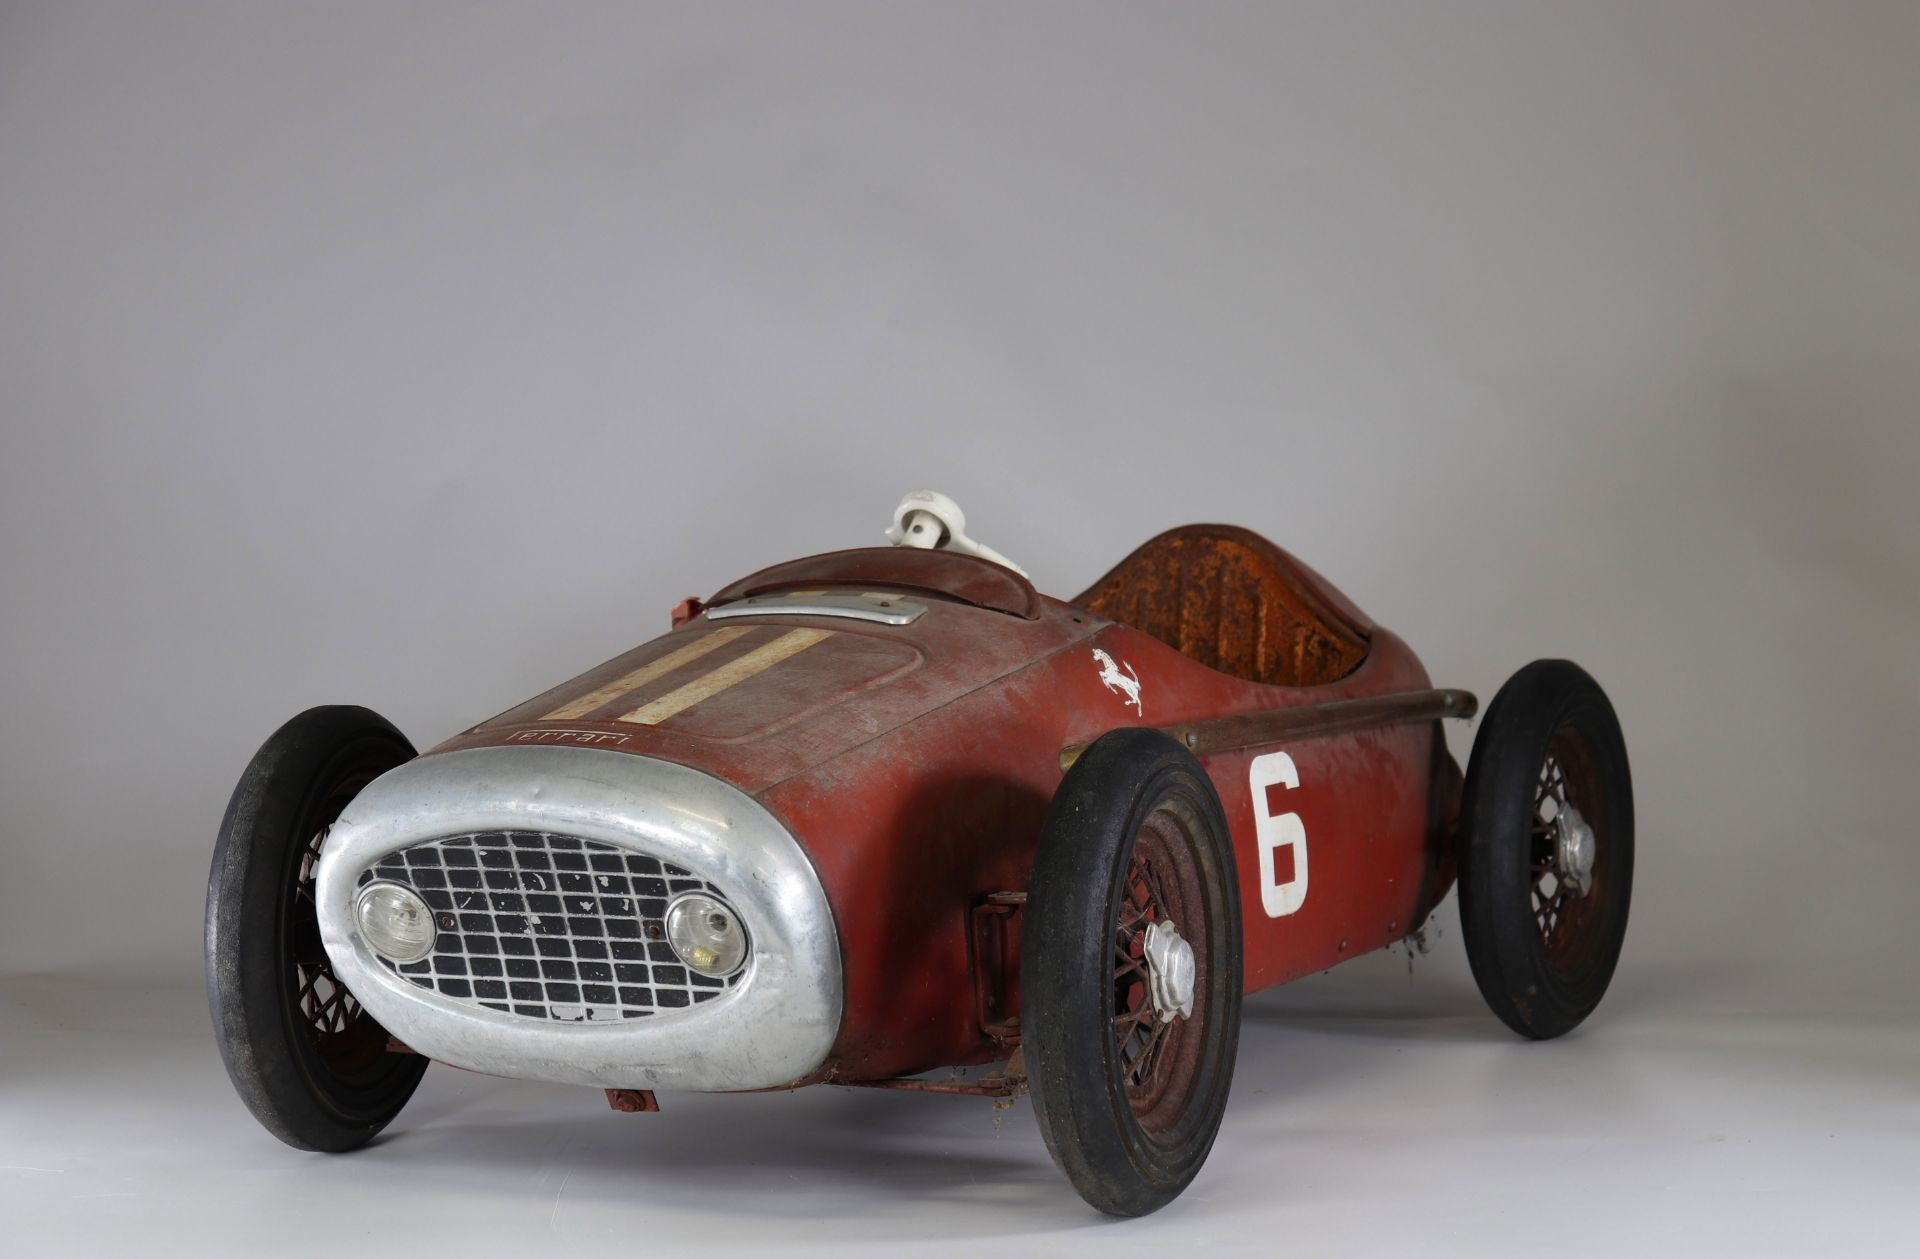 Old Ferrari pedal car